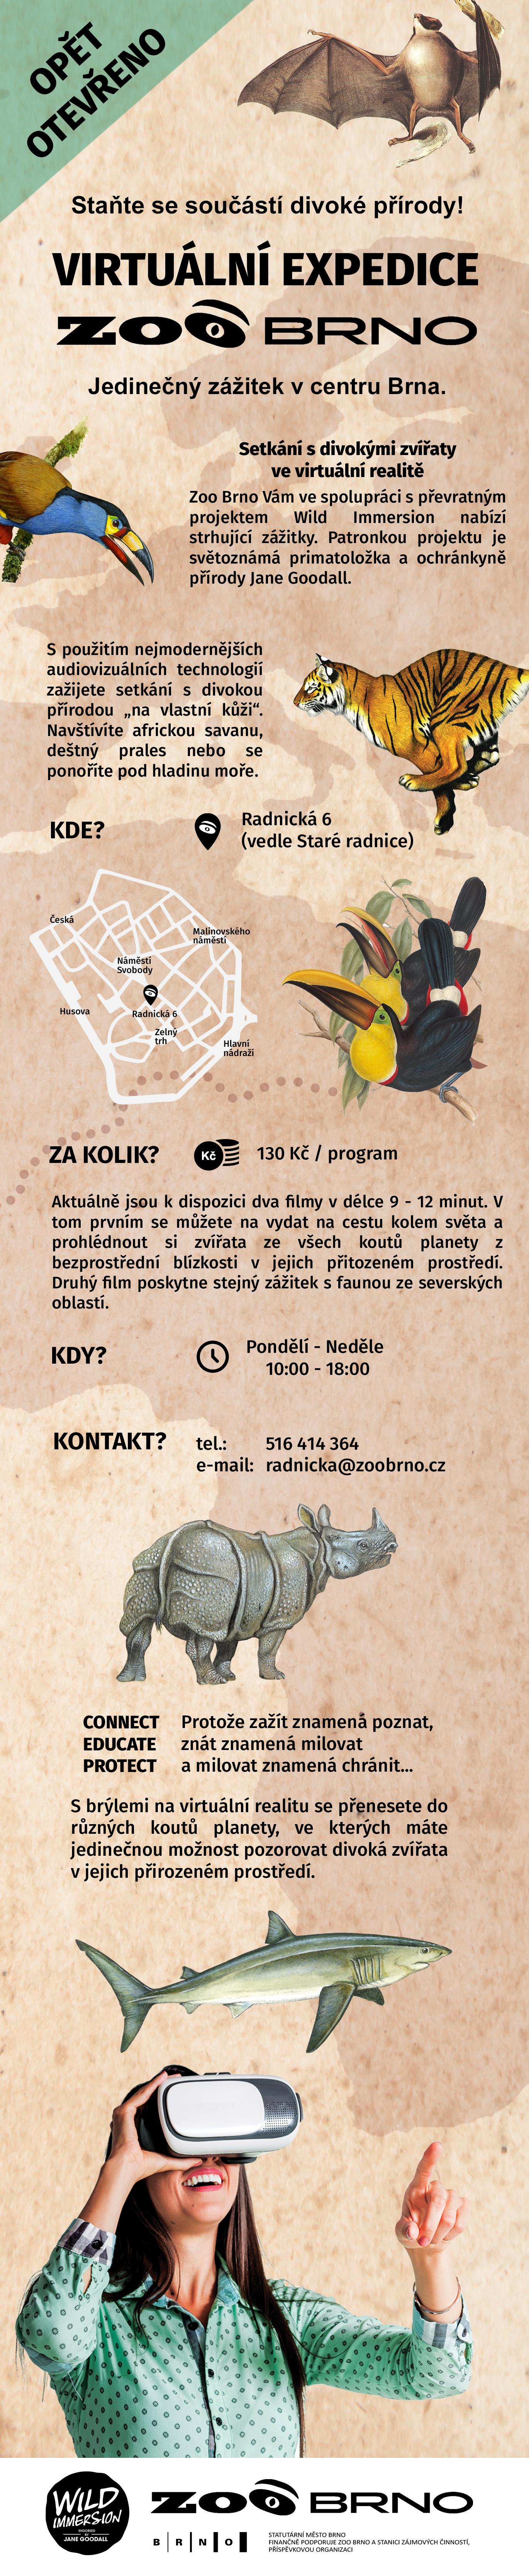 infooVirtuálníexpedici